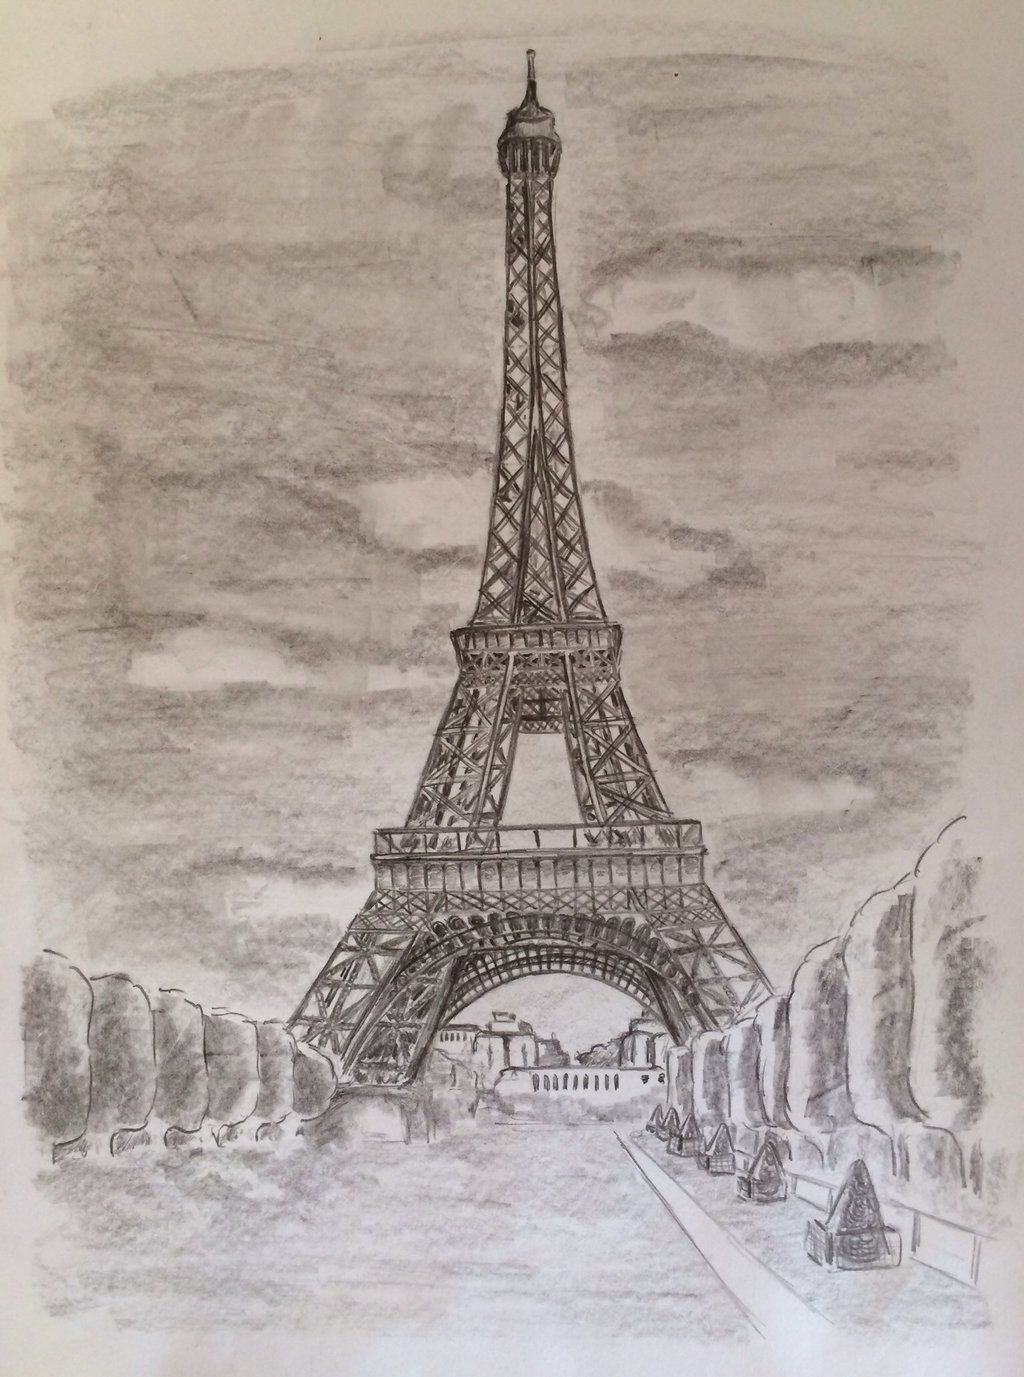 Tour Eiffel tower paris france black white drawing by ...